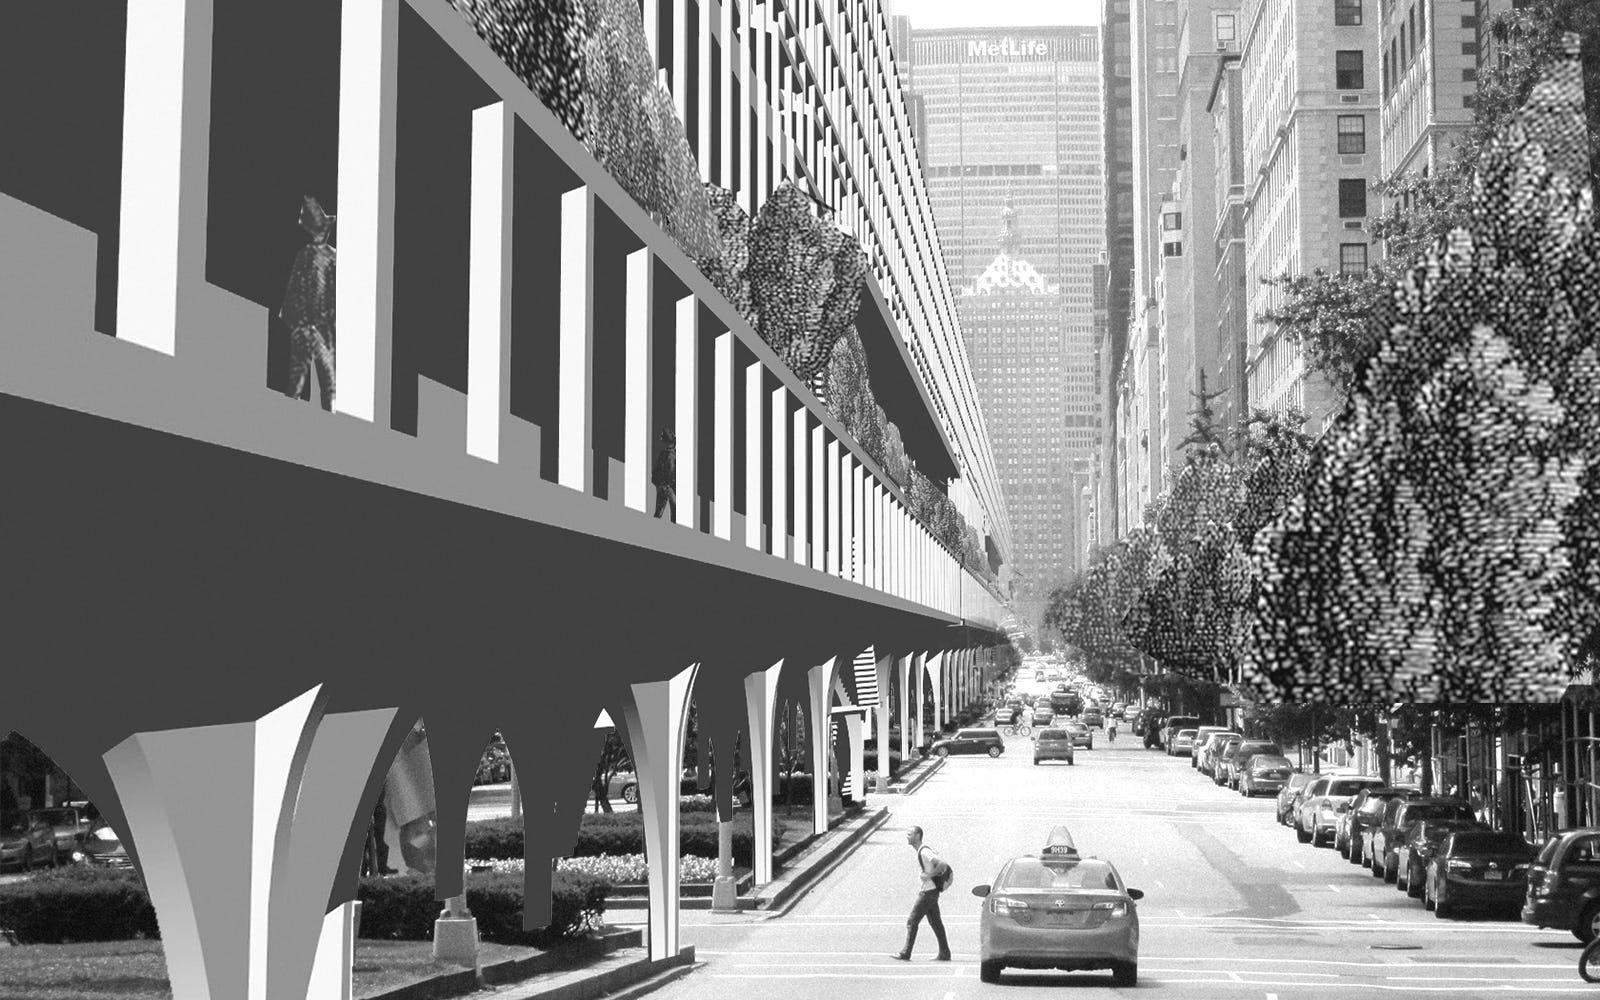 Fantasticoffense infrastructuralinfill perspective 1 midtown